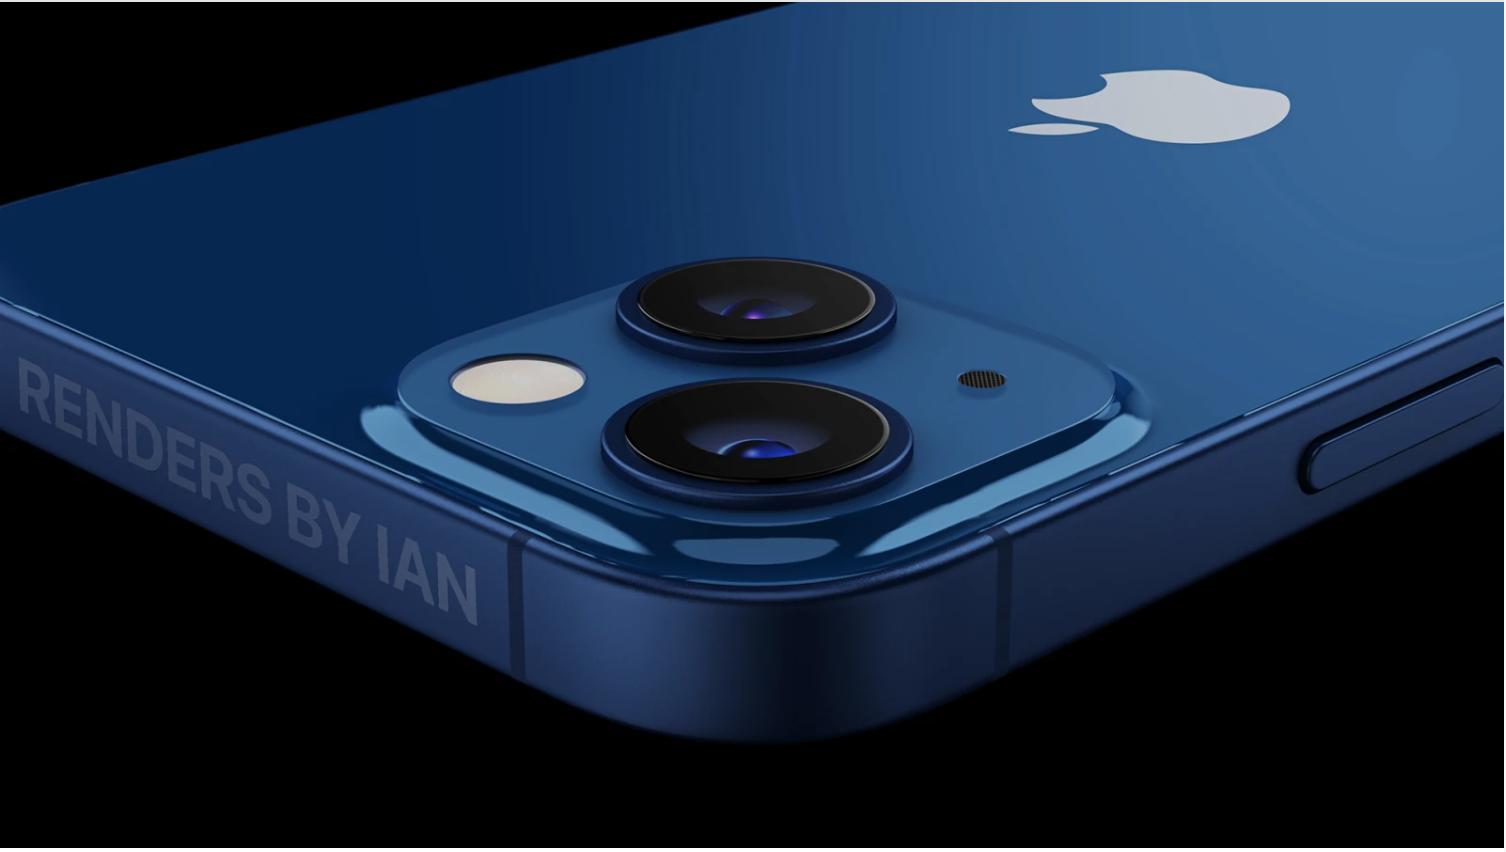 Bản dựng iPhone 13 của Ian.